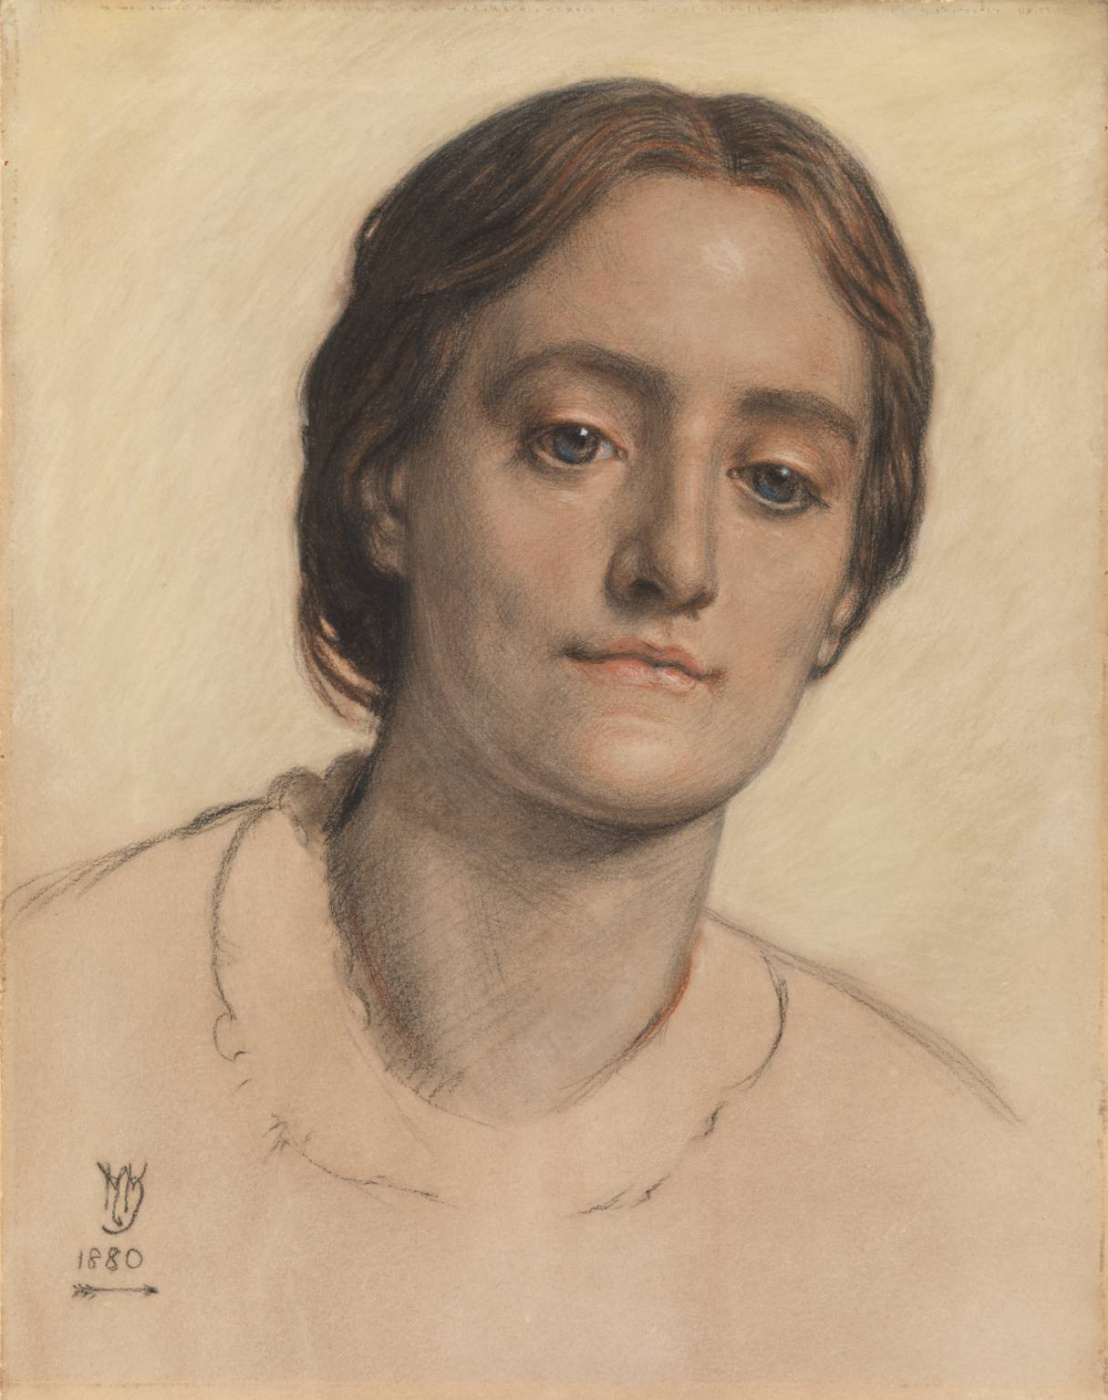 William Holman Hunt. Portrait of Mrs Edith Holman hunt